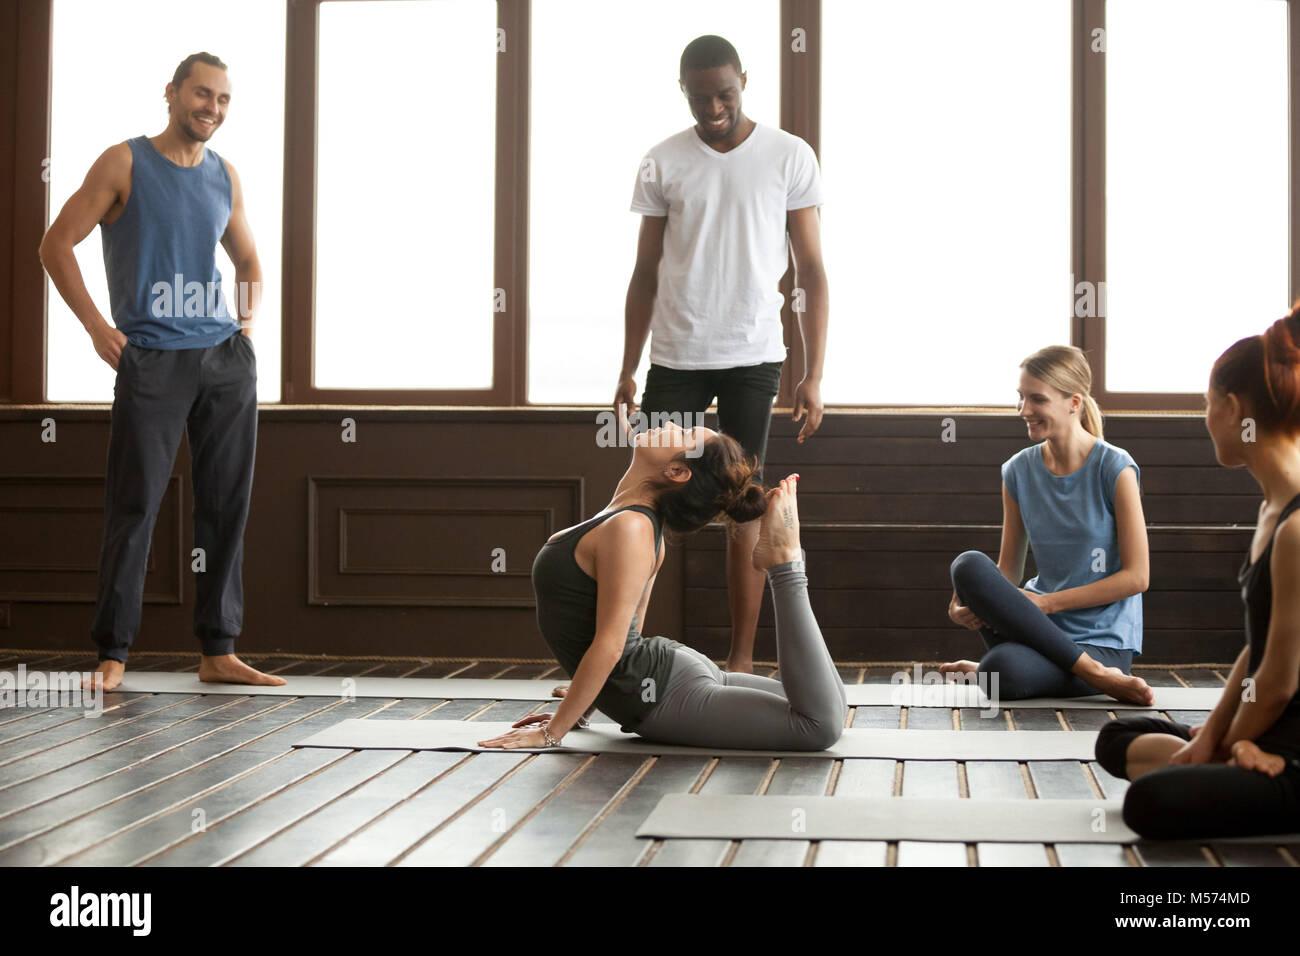 El instructor de yoga de Raja bhudjangasana realizar ejercicio avanzado Imagen De Stock